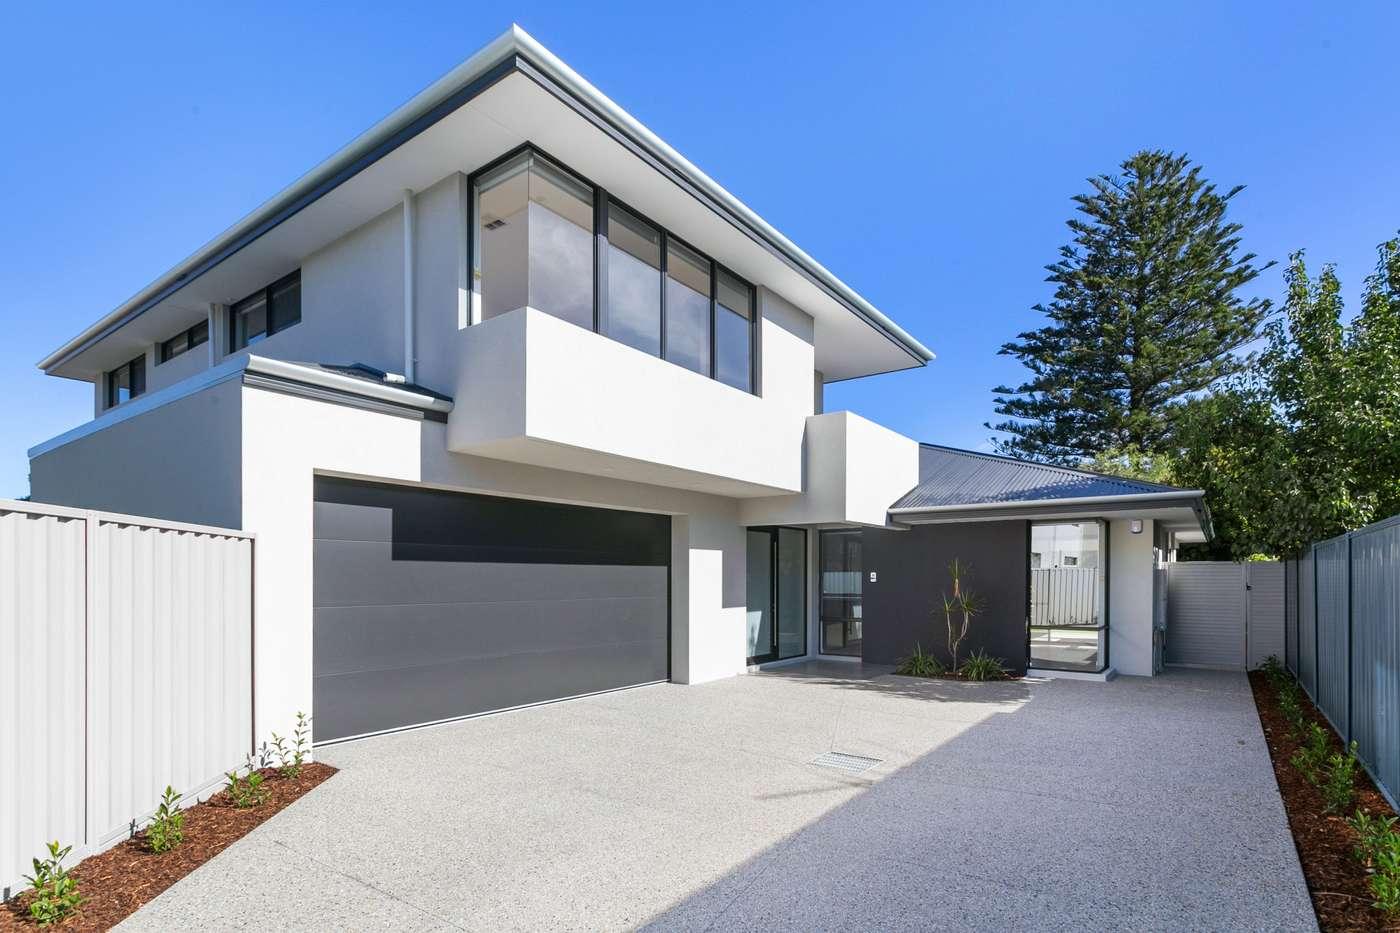 Main view of Homely house listing, 51B Ardross Street, Applecross, WA 6153